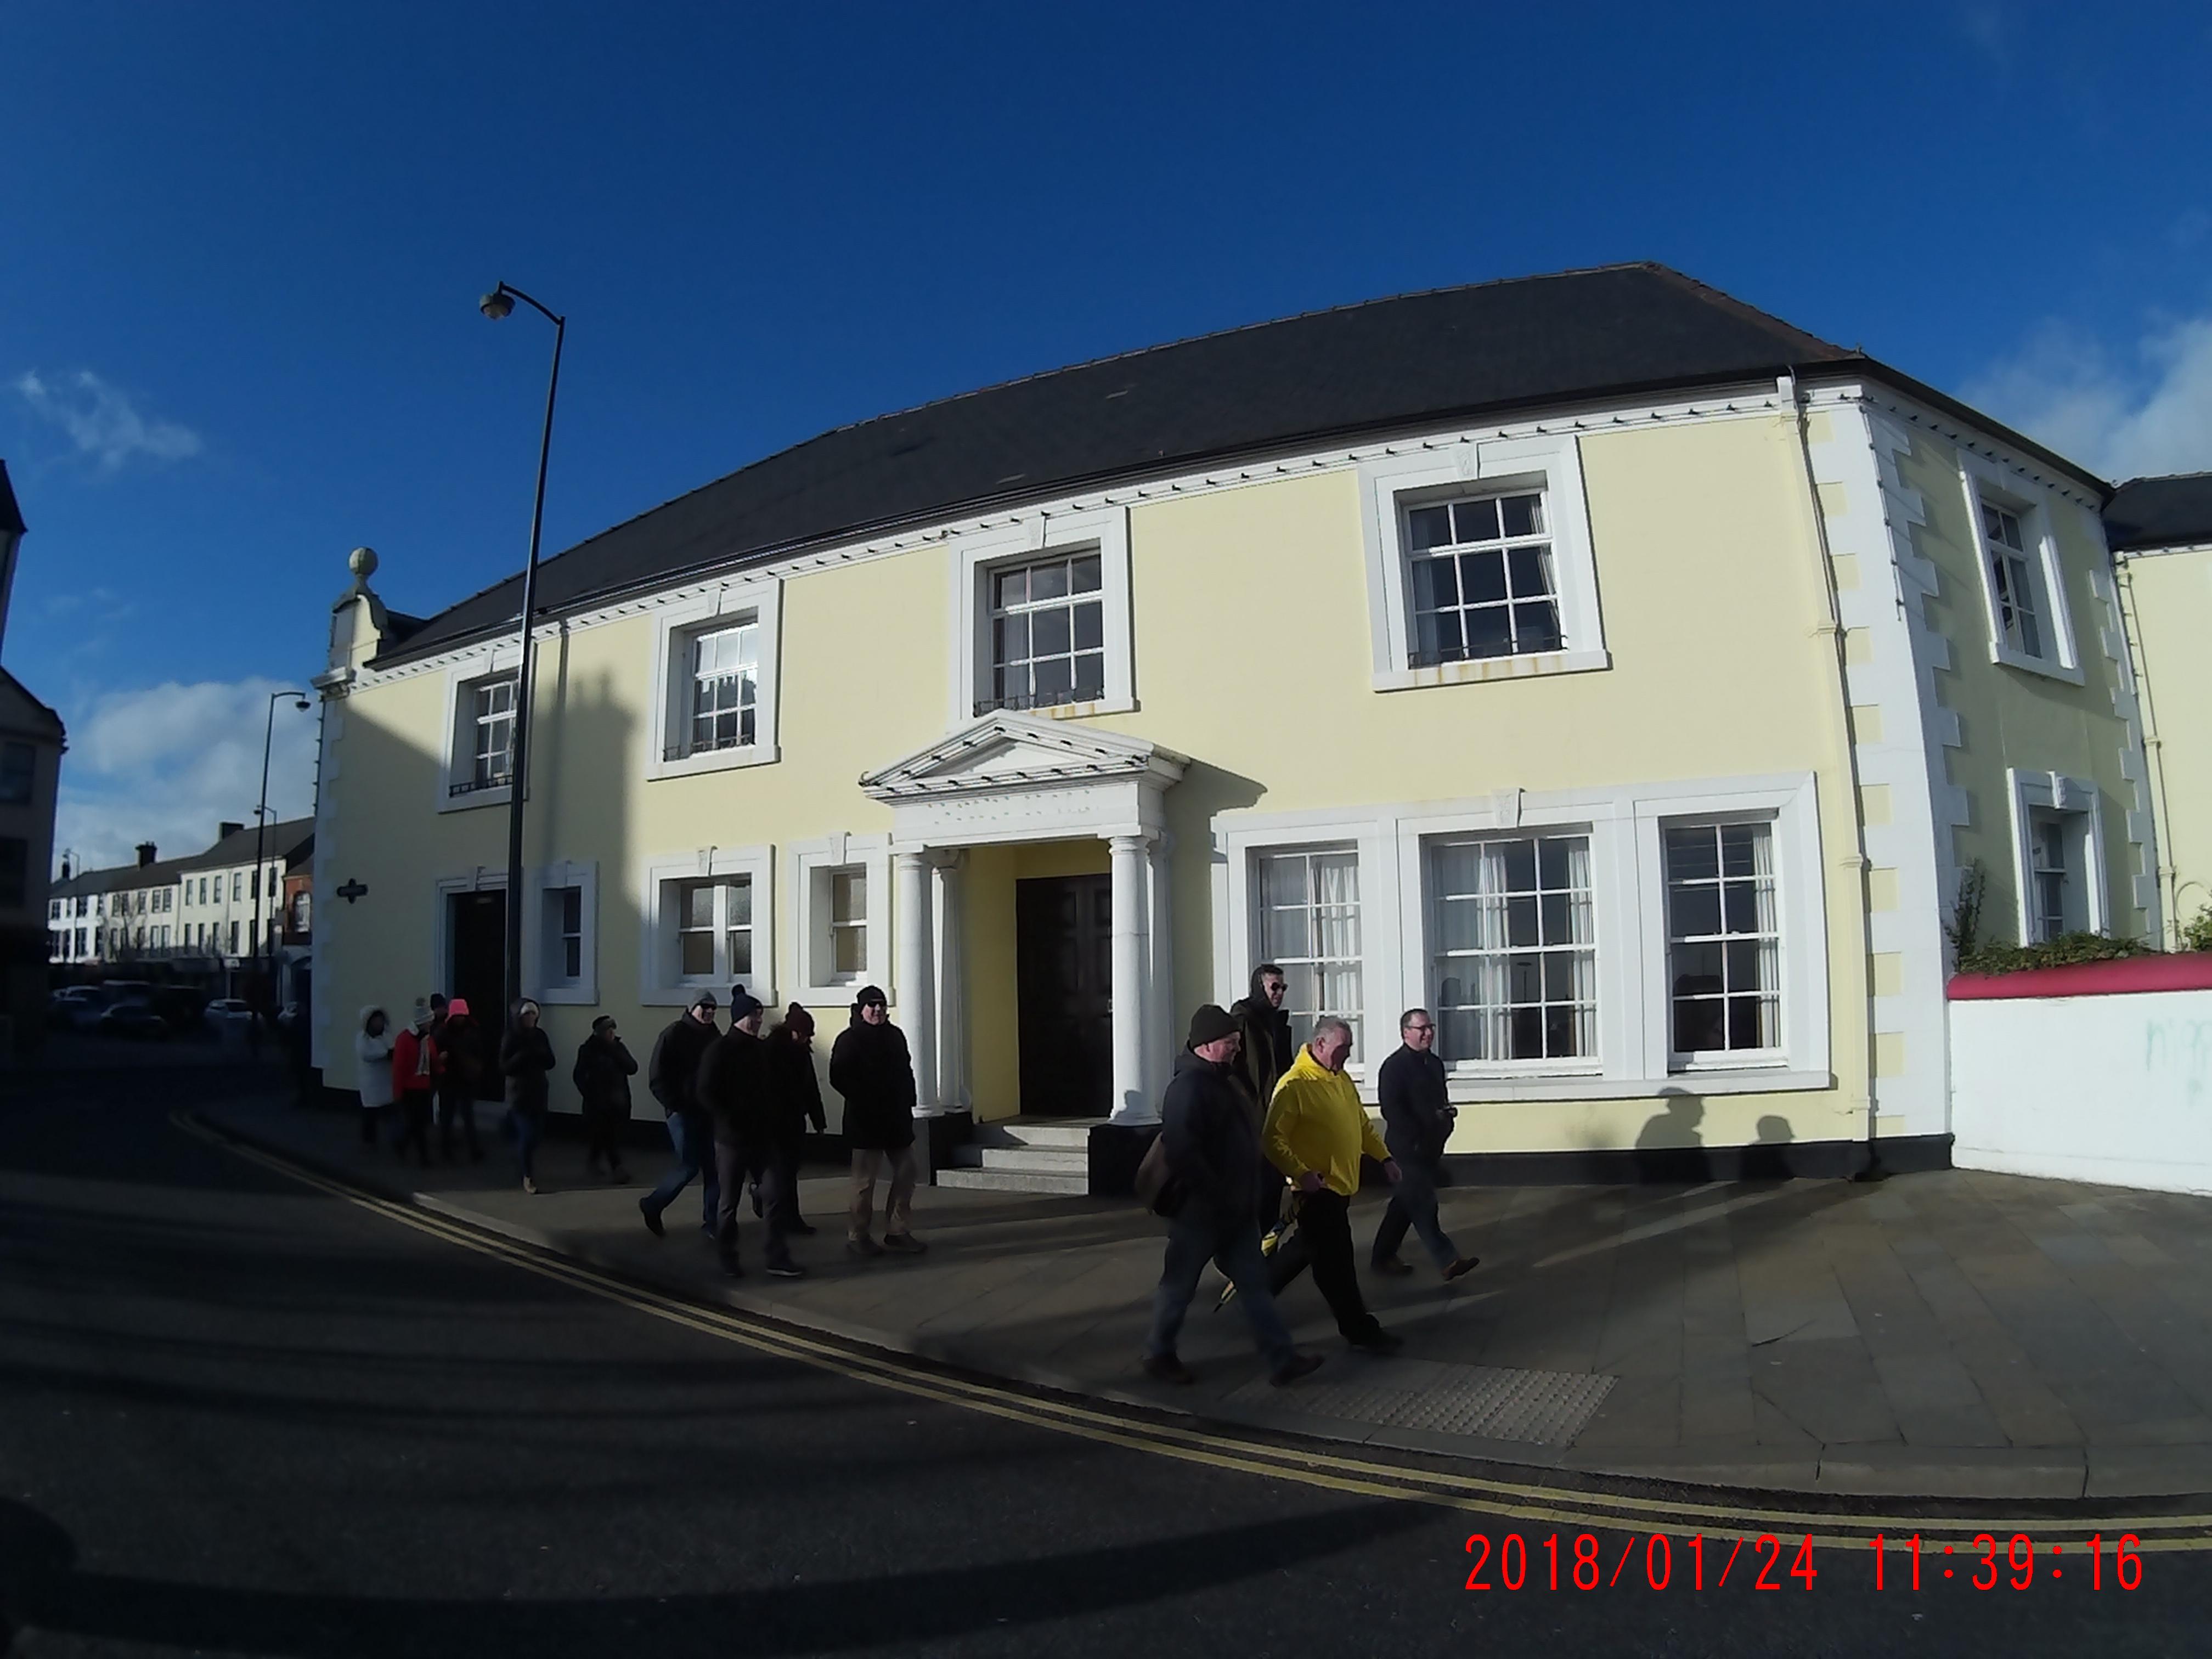 Carrickfergus Town Hall